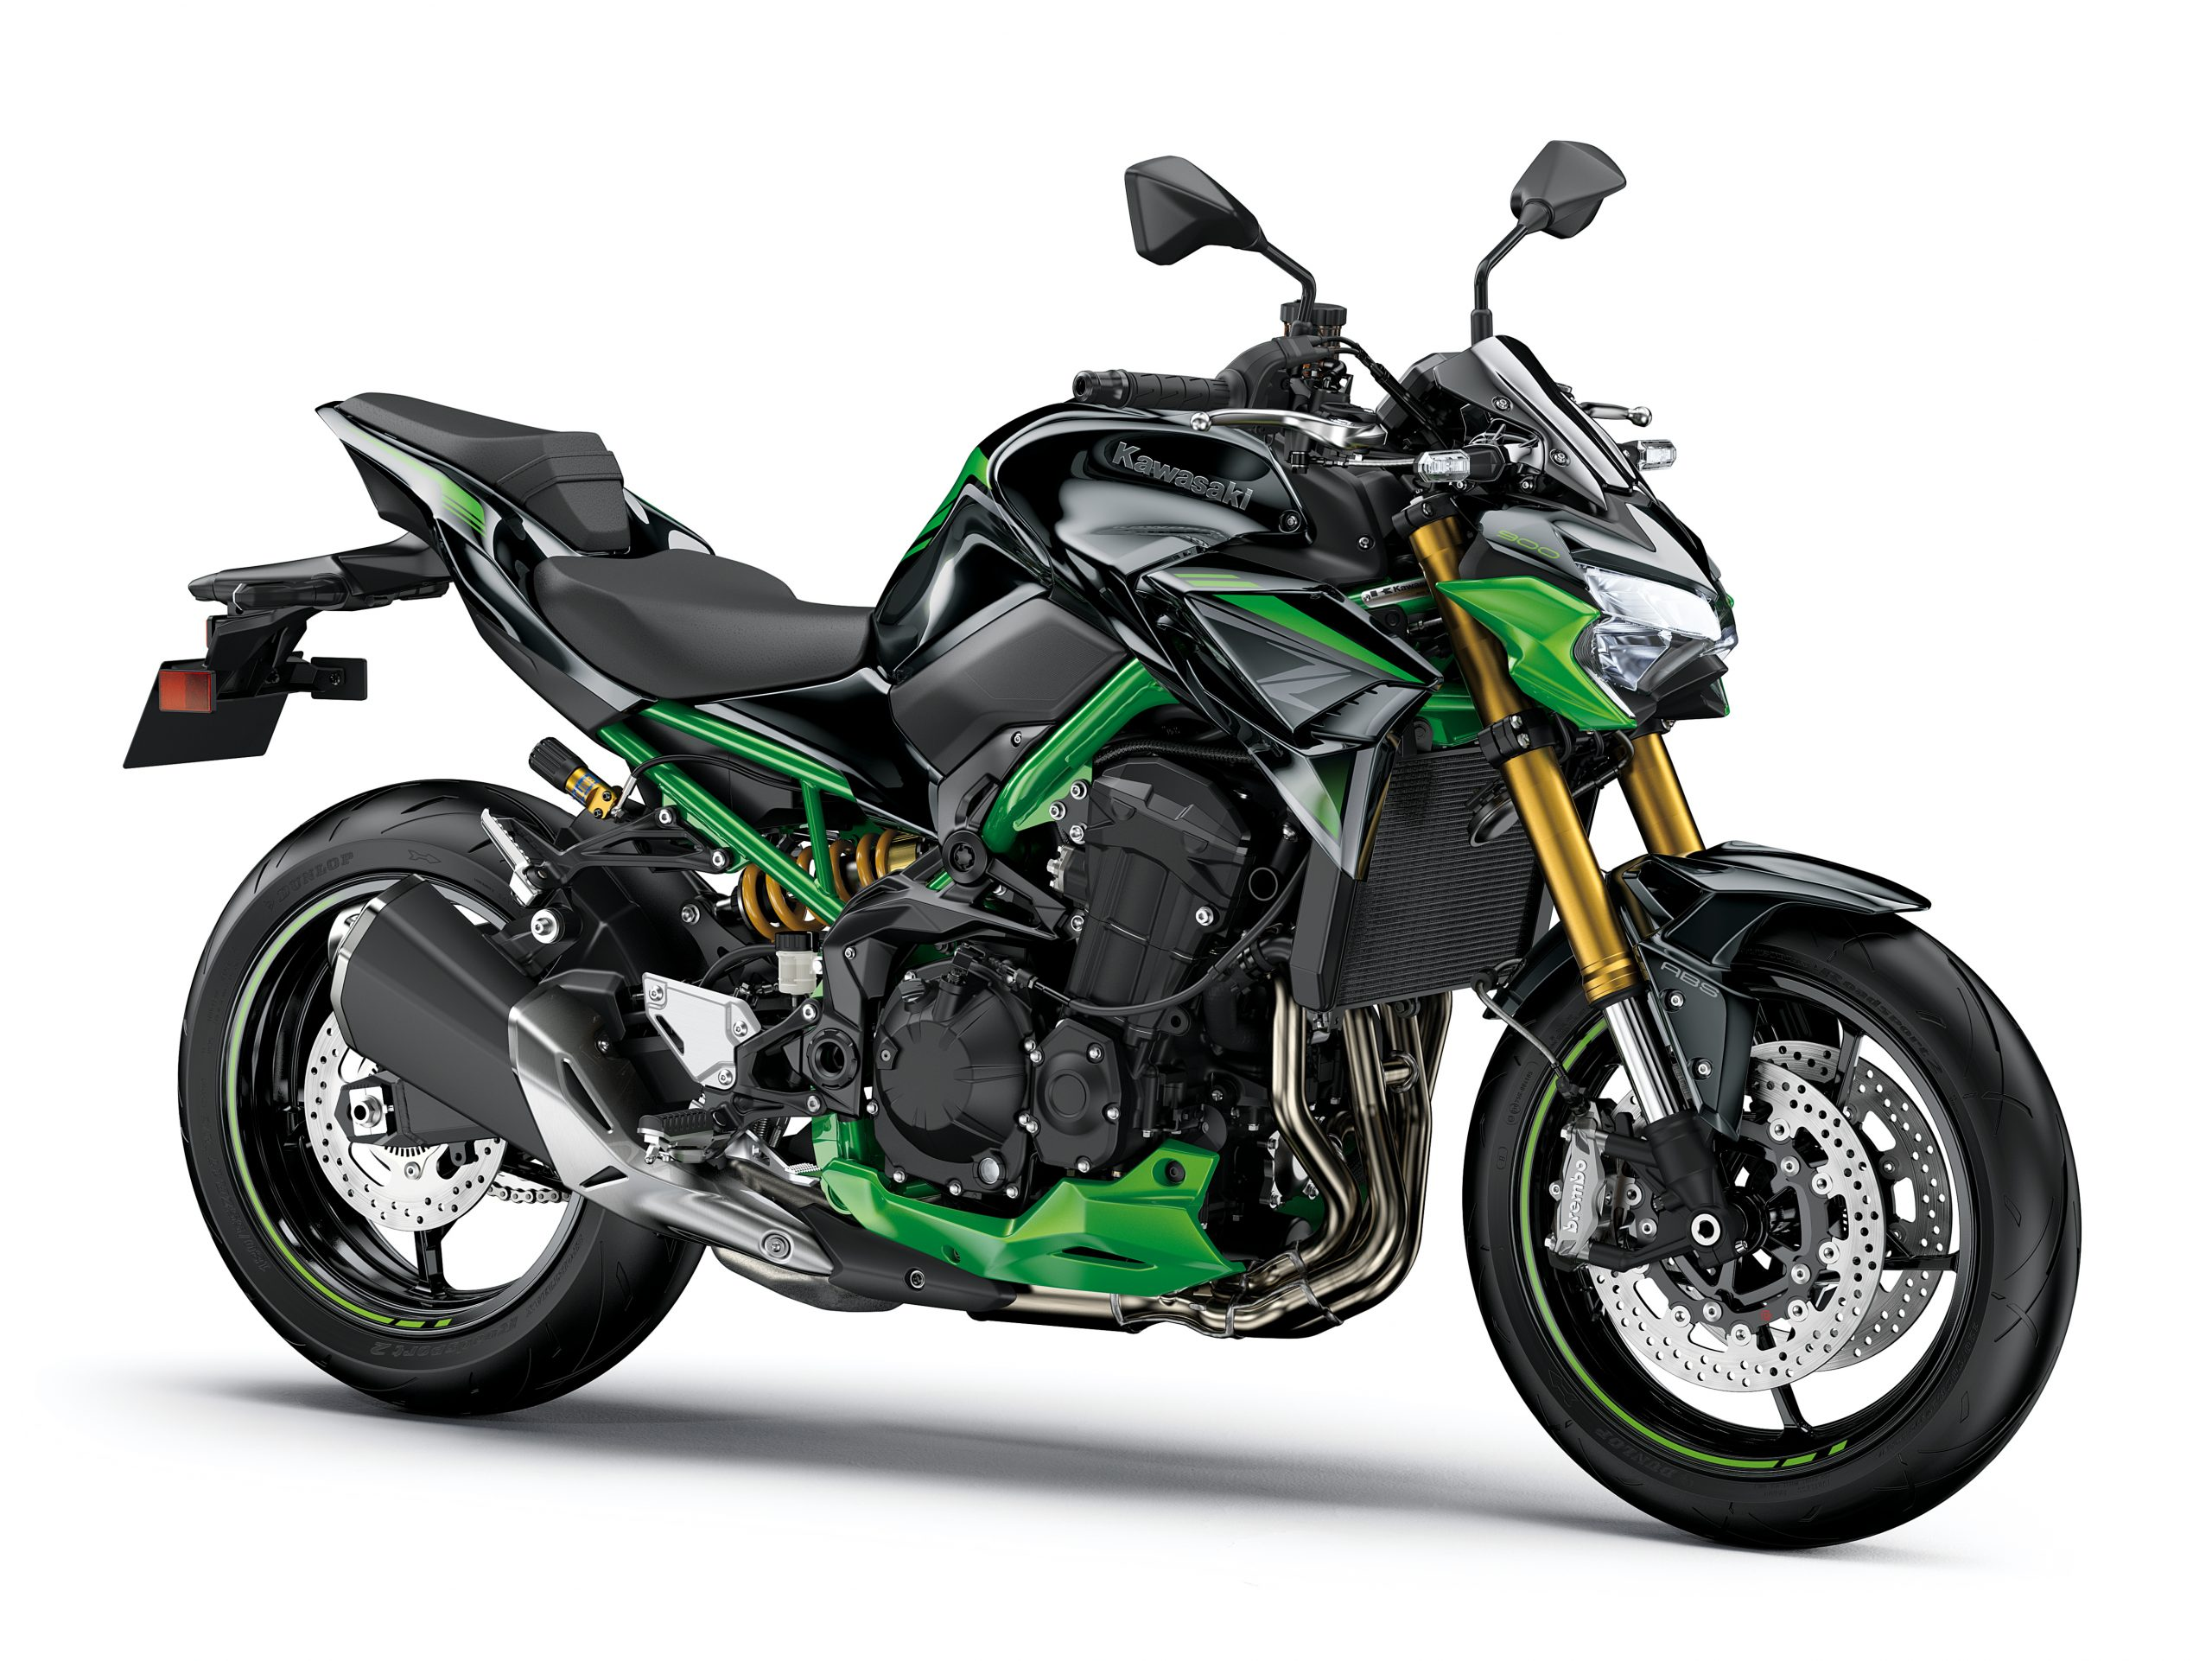 Kawasaki introduces Z900 SE – Motokicx